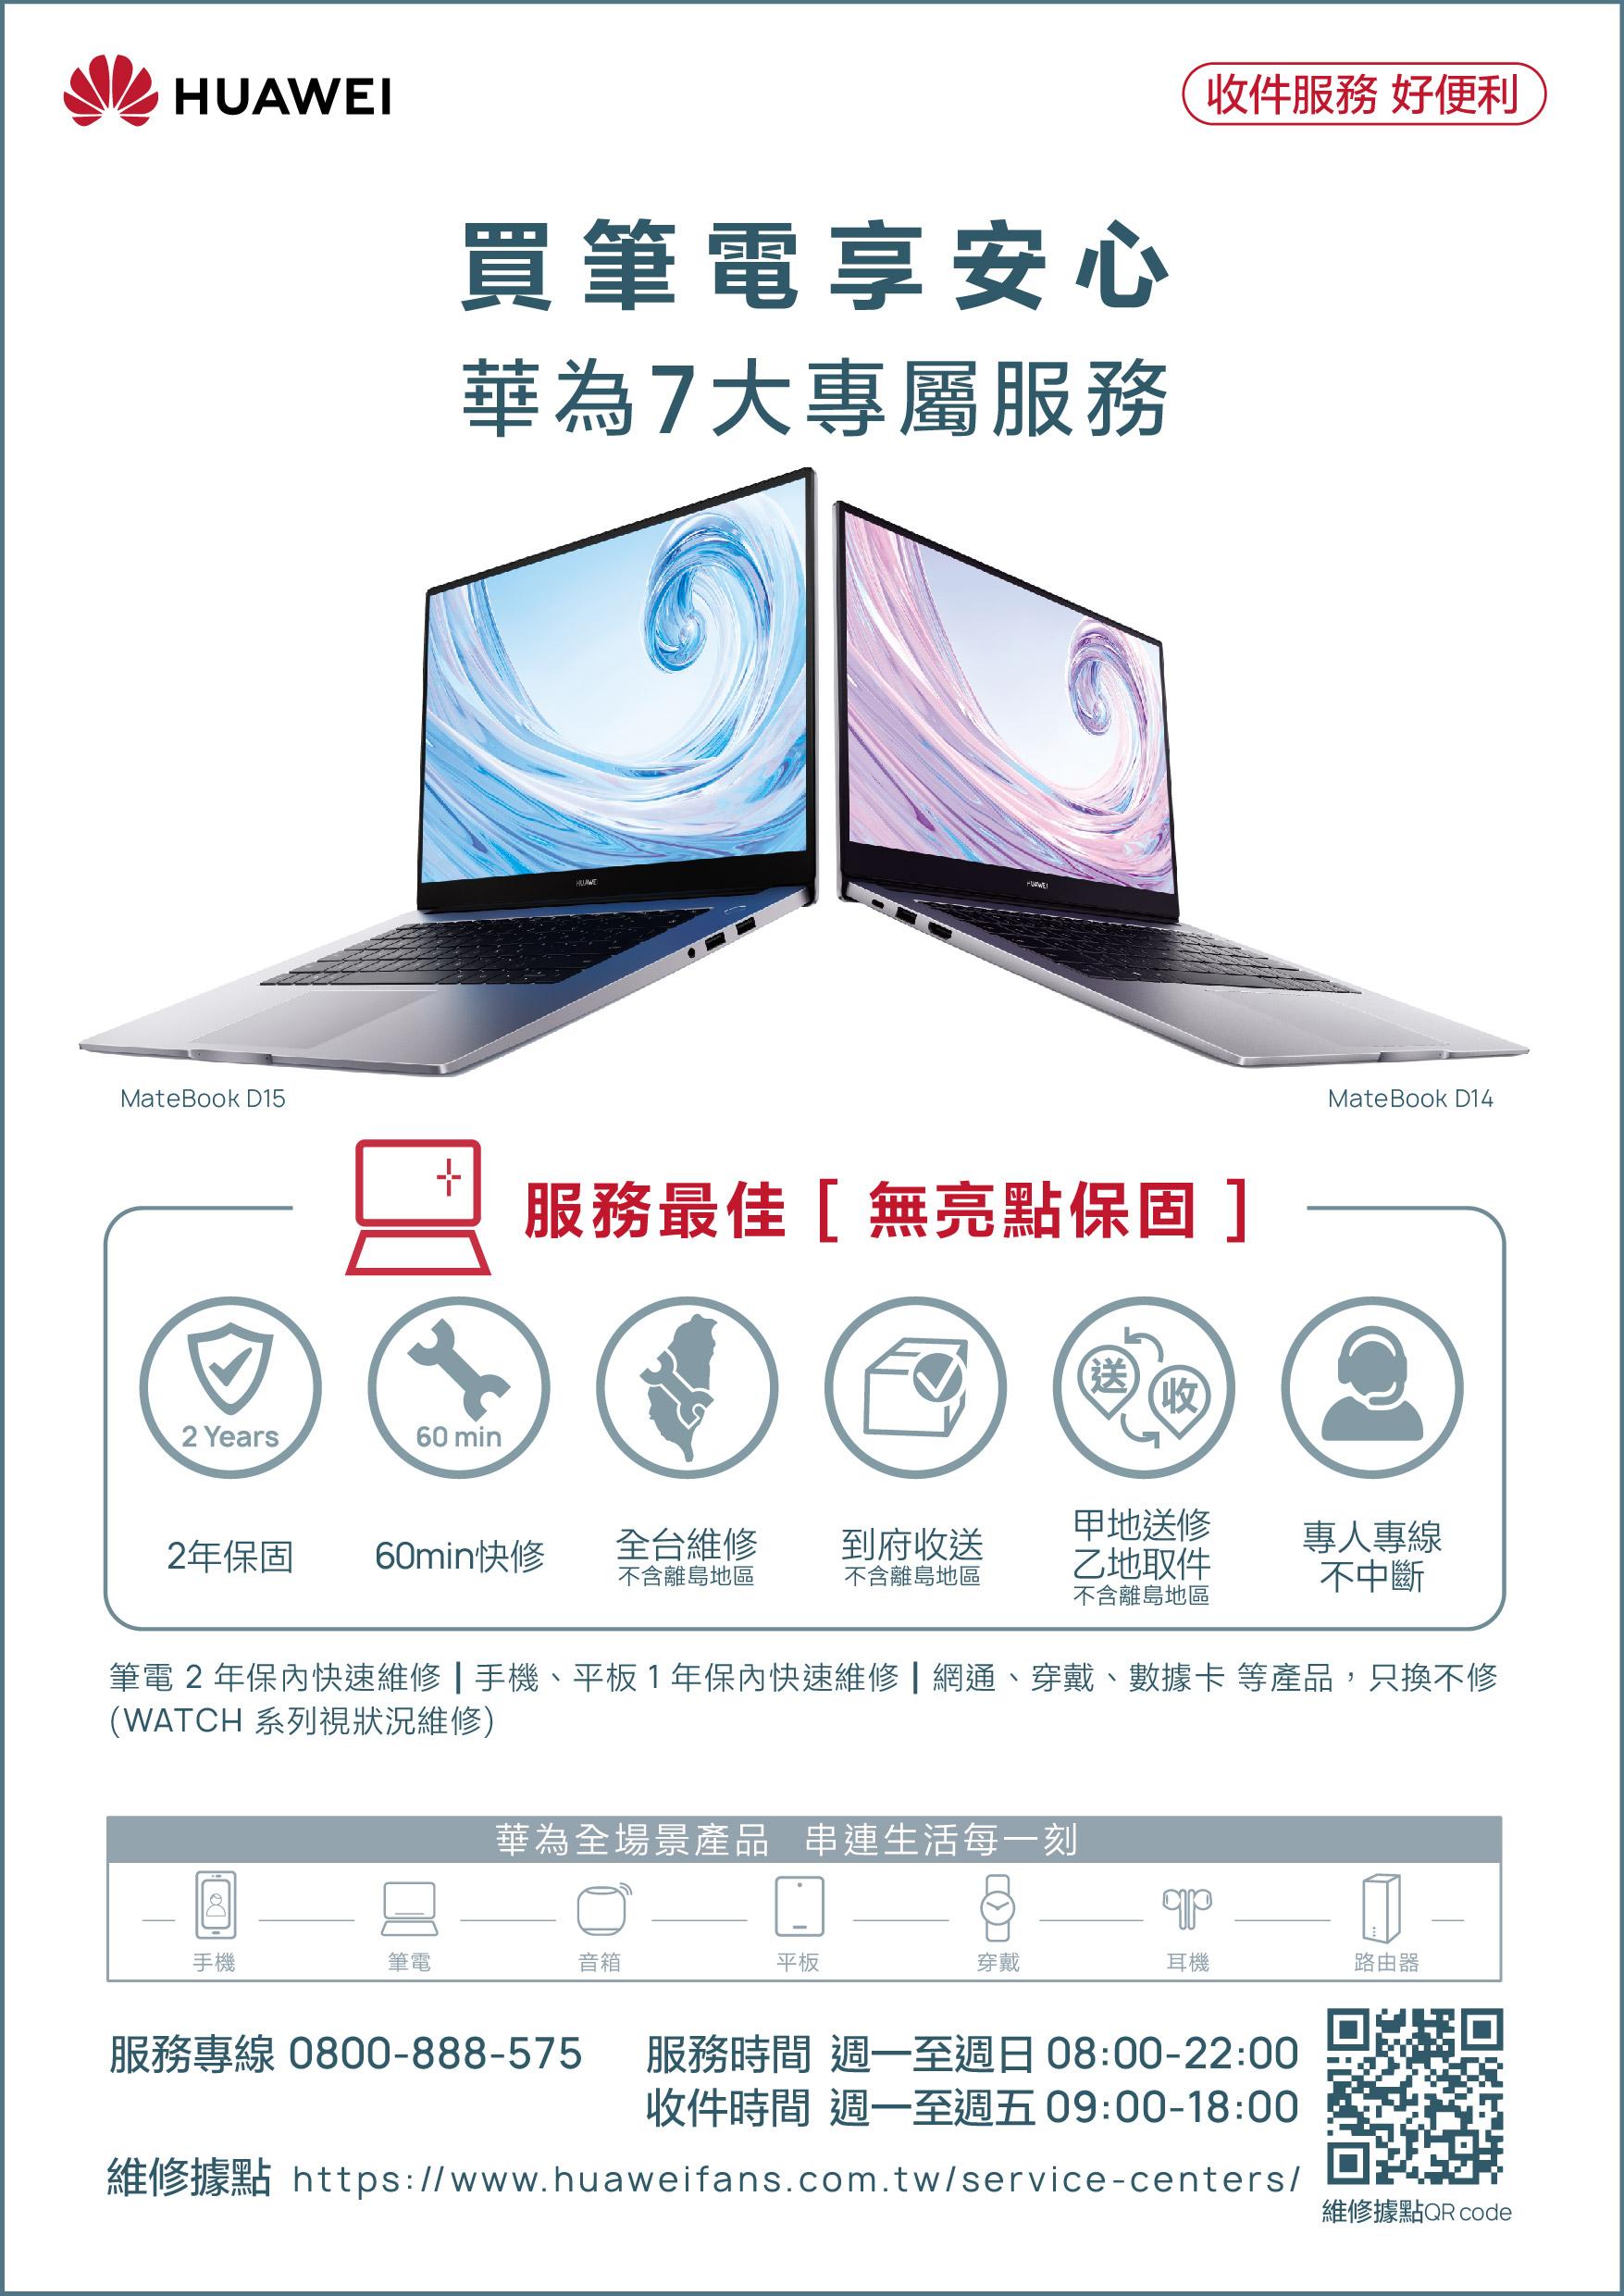 HUAWEI】買筆電享安心,華為七大專屬服務